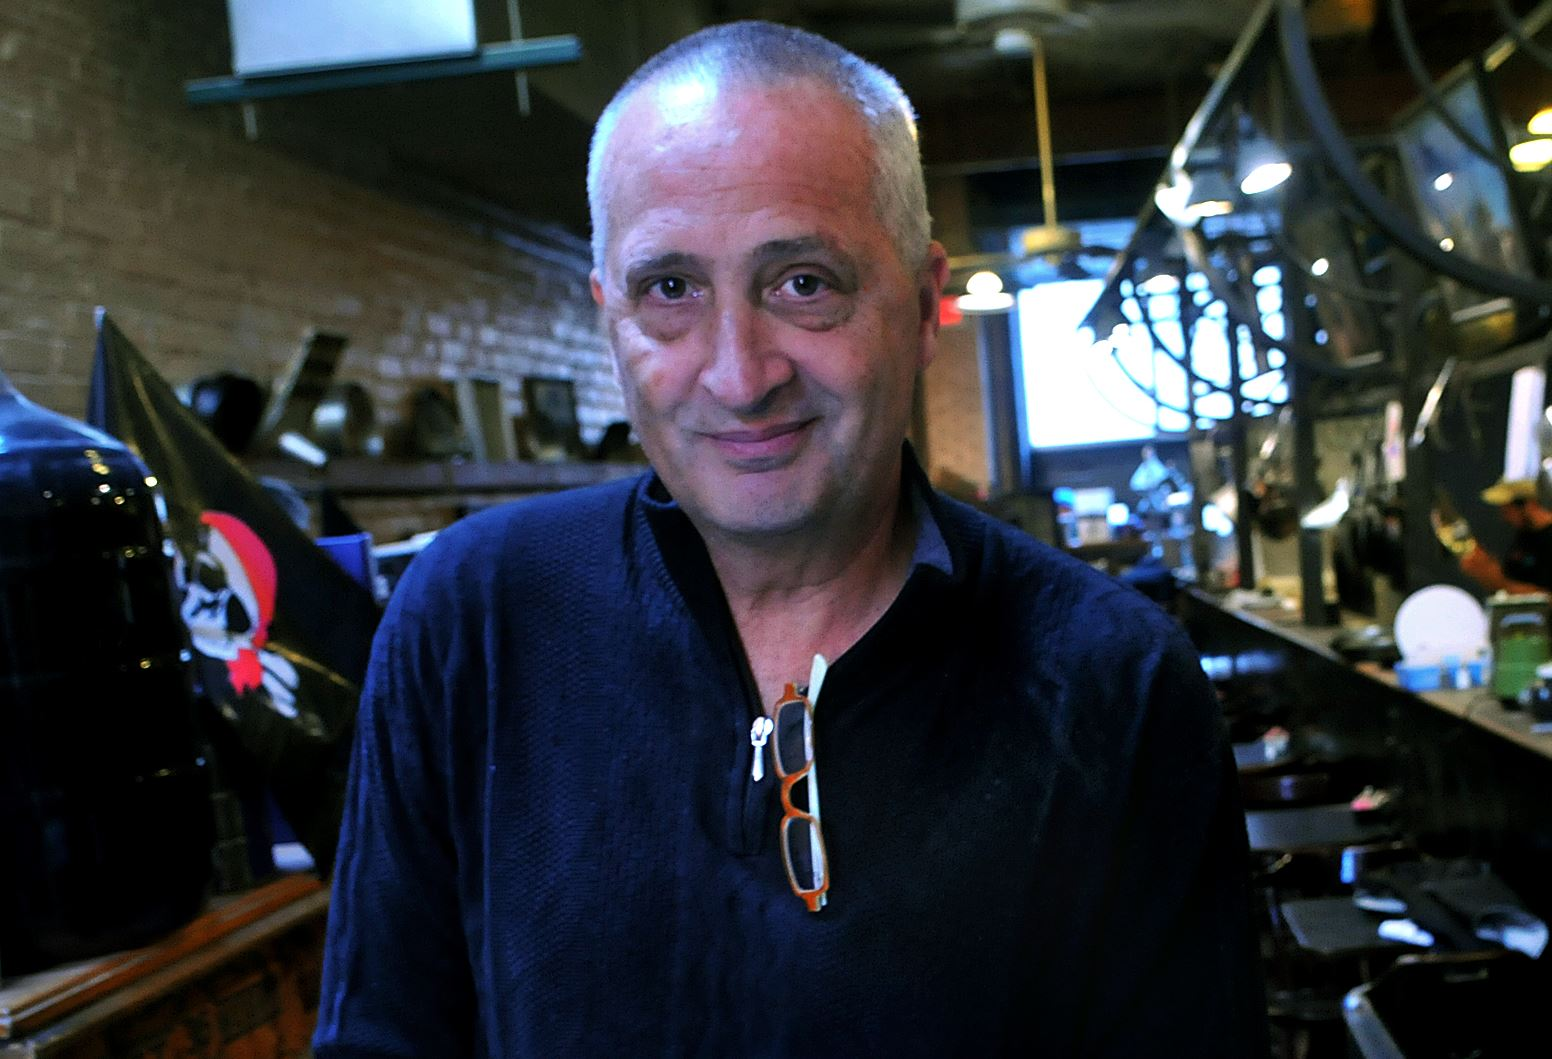 lagattutafood01 Larry Lagattuta poses at Enrico Biscotti.